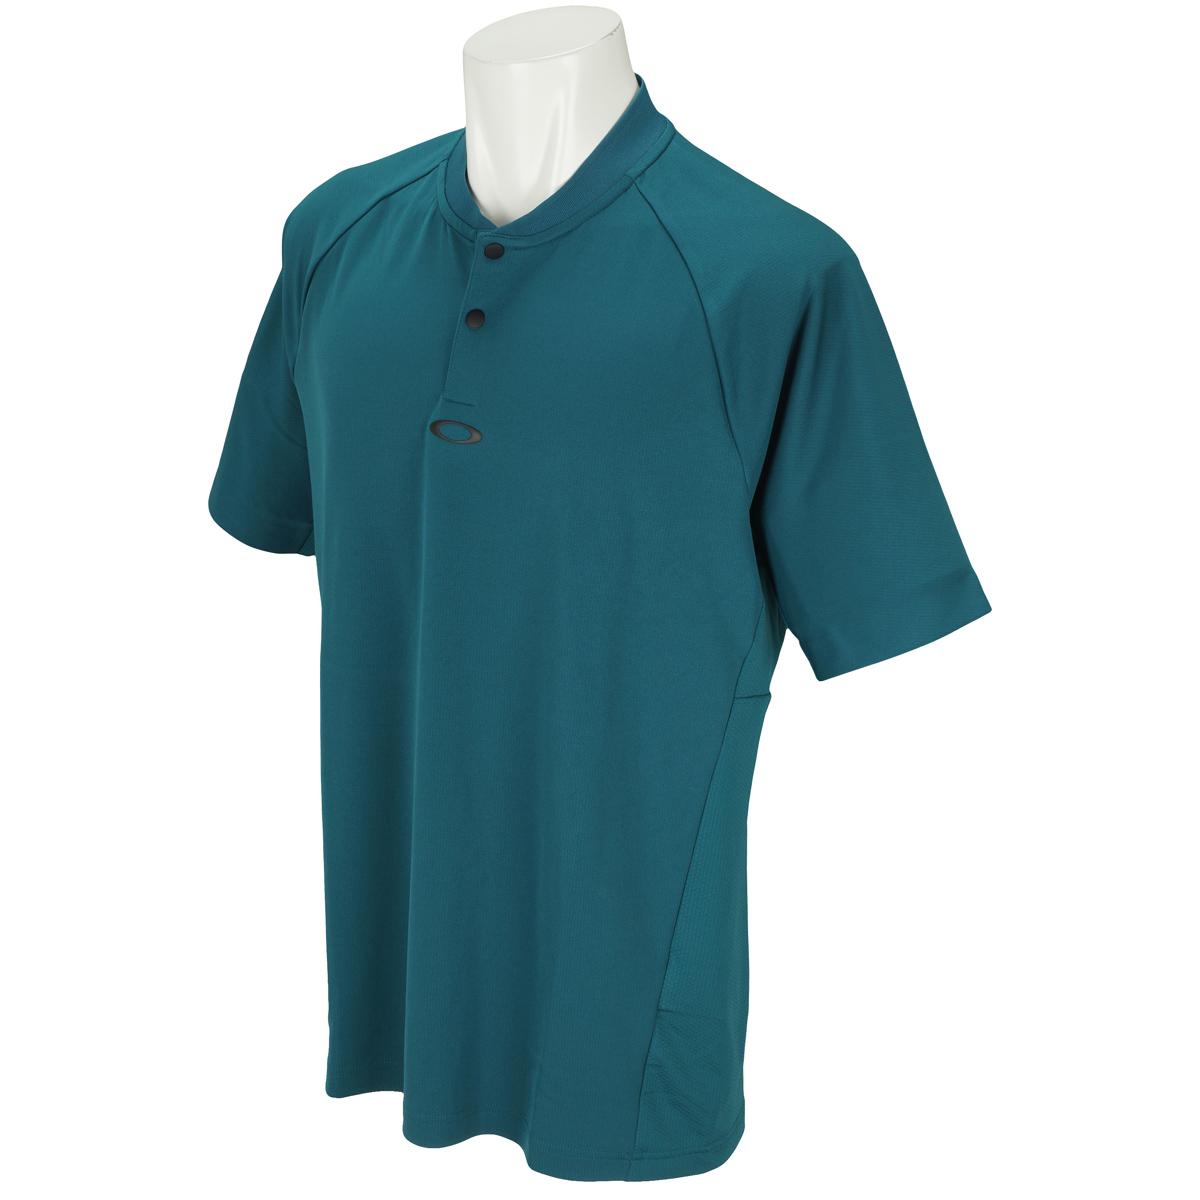 ERGONOMIC EVOLUTION 半袖ポロシャツ